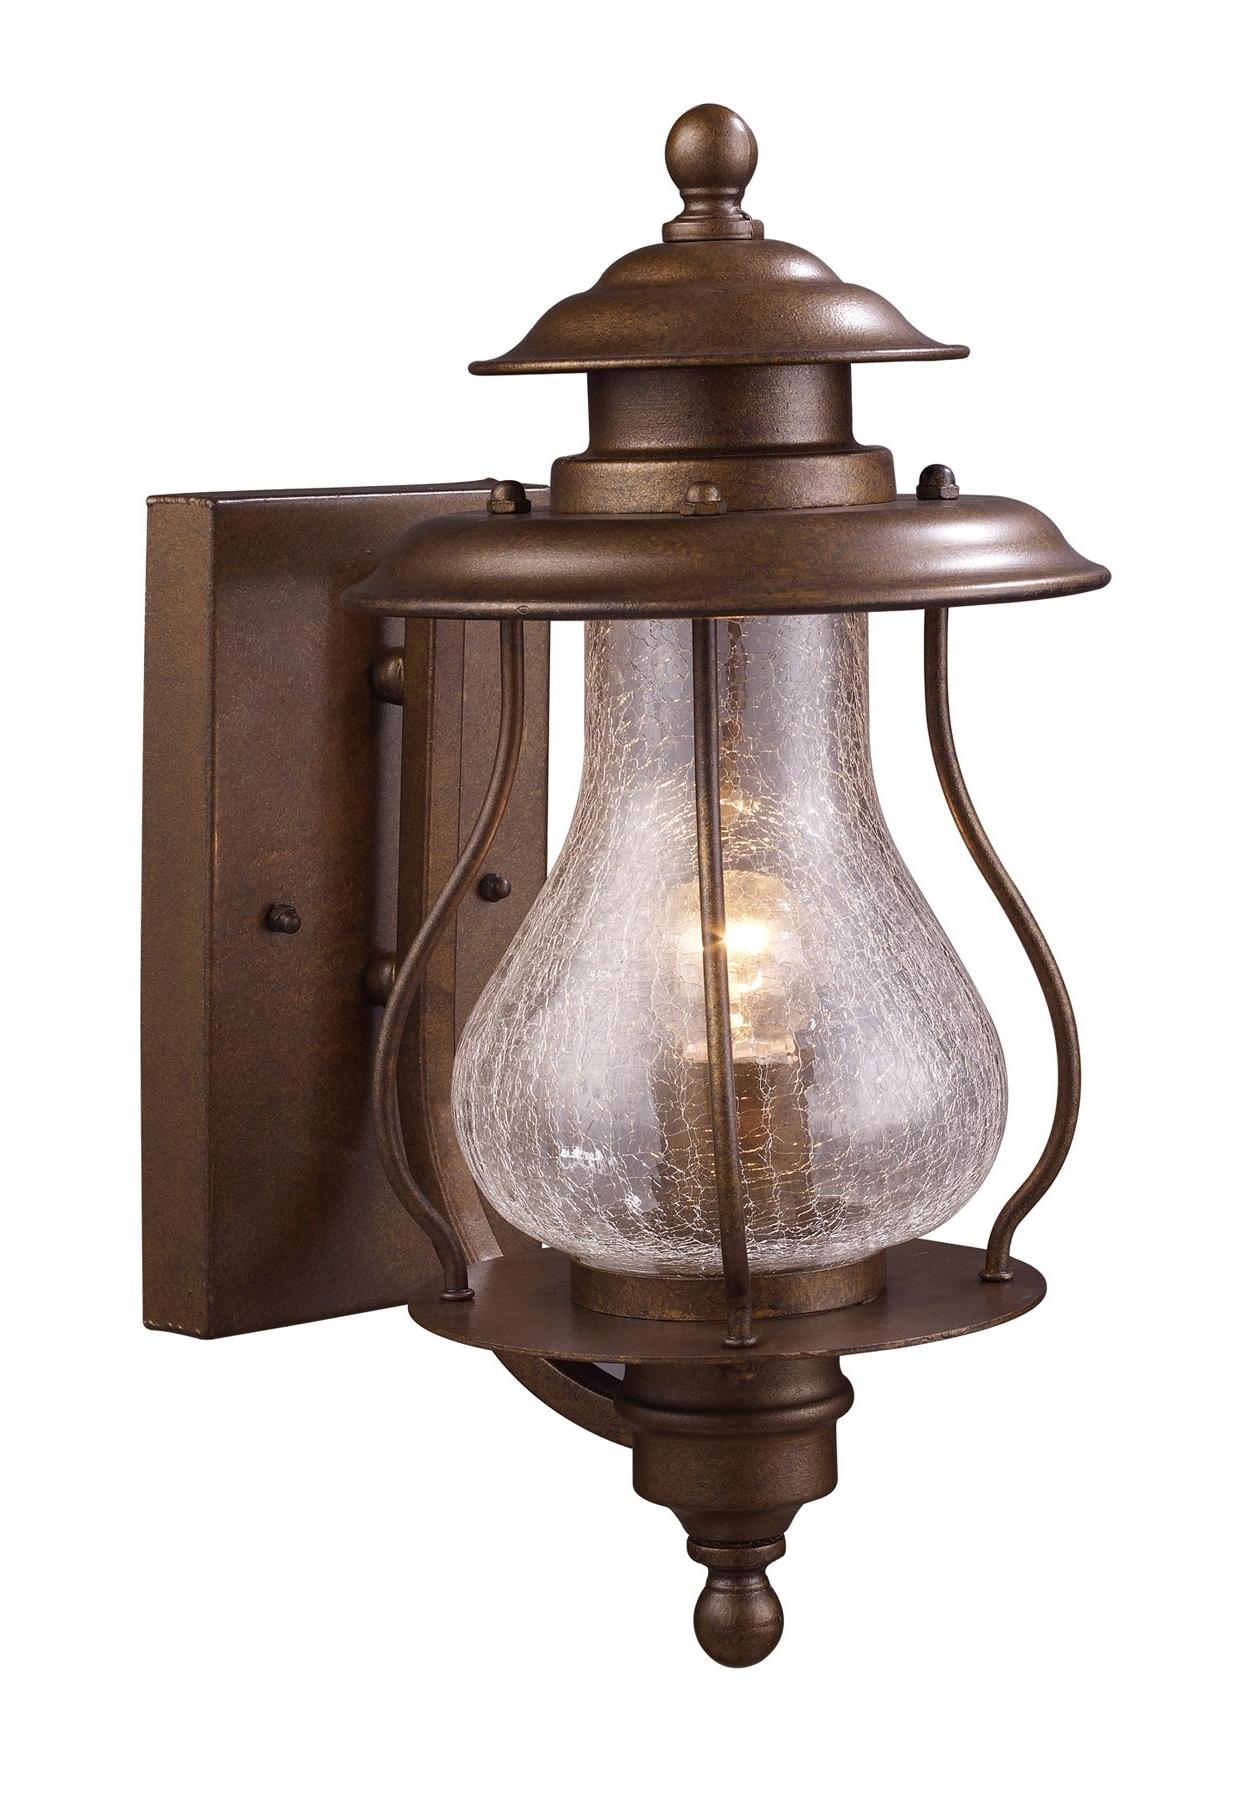 Elk Lighting 62005 1 Wikshire Outdoor Wall Mount Lantern Inside Preferred Outdoor Lanterns Lights (View 3 of 20)